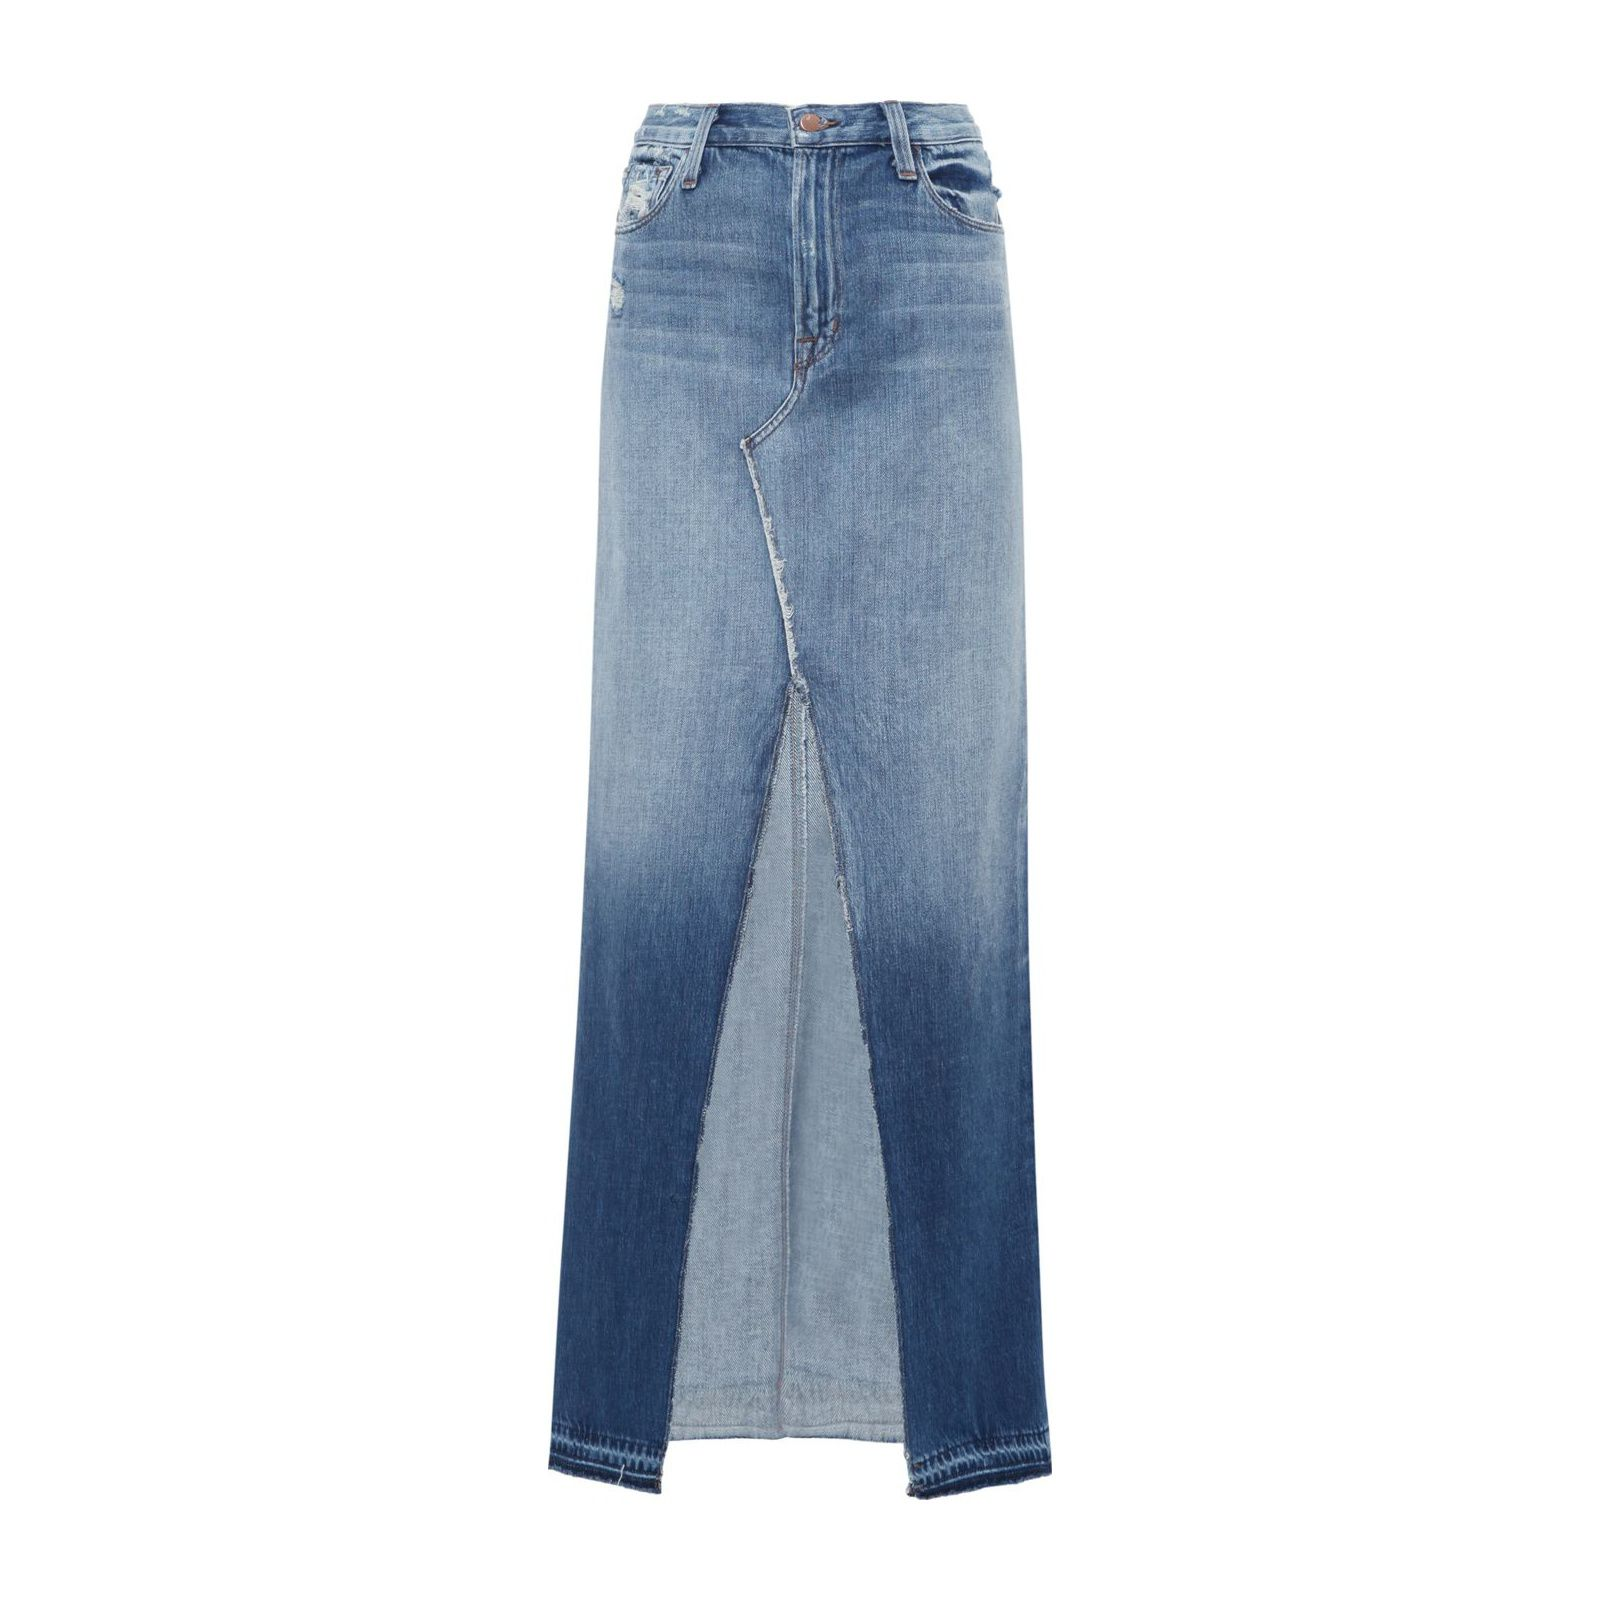 Saia Jeans Trystan Maxi - Azul